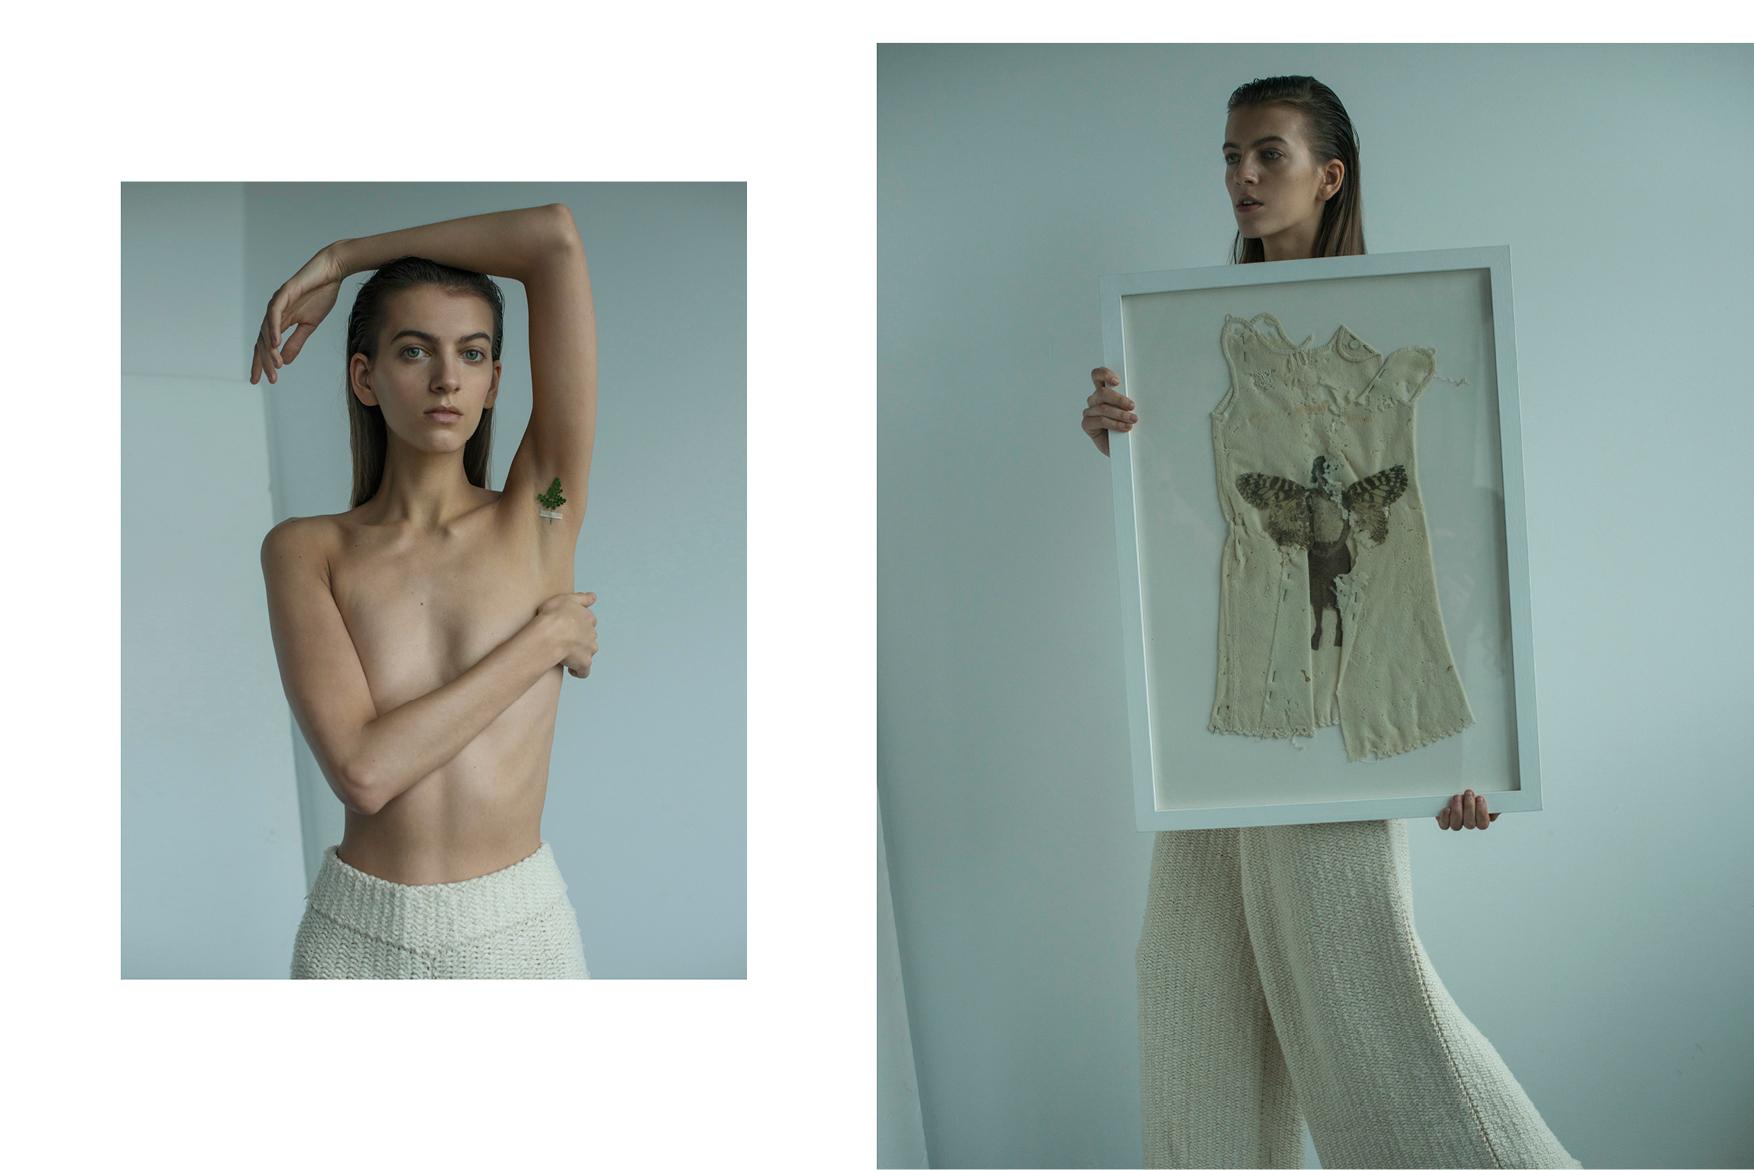 Lissome-Louise-Richardson-Anna Rosa Krau-Sustainable-Fashion35.jpg